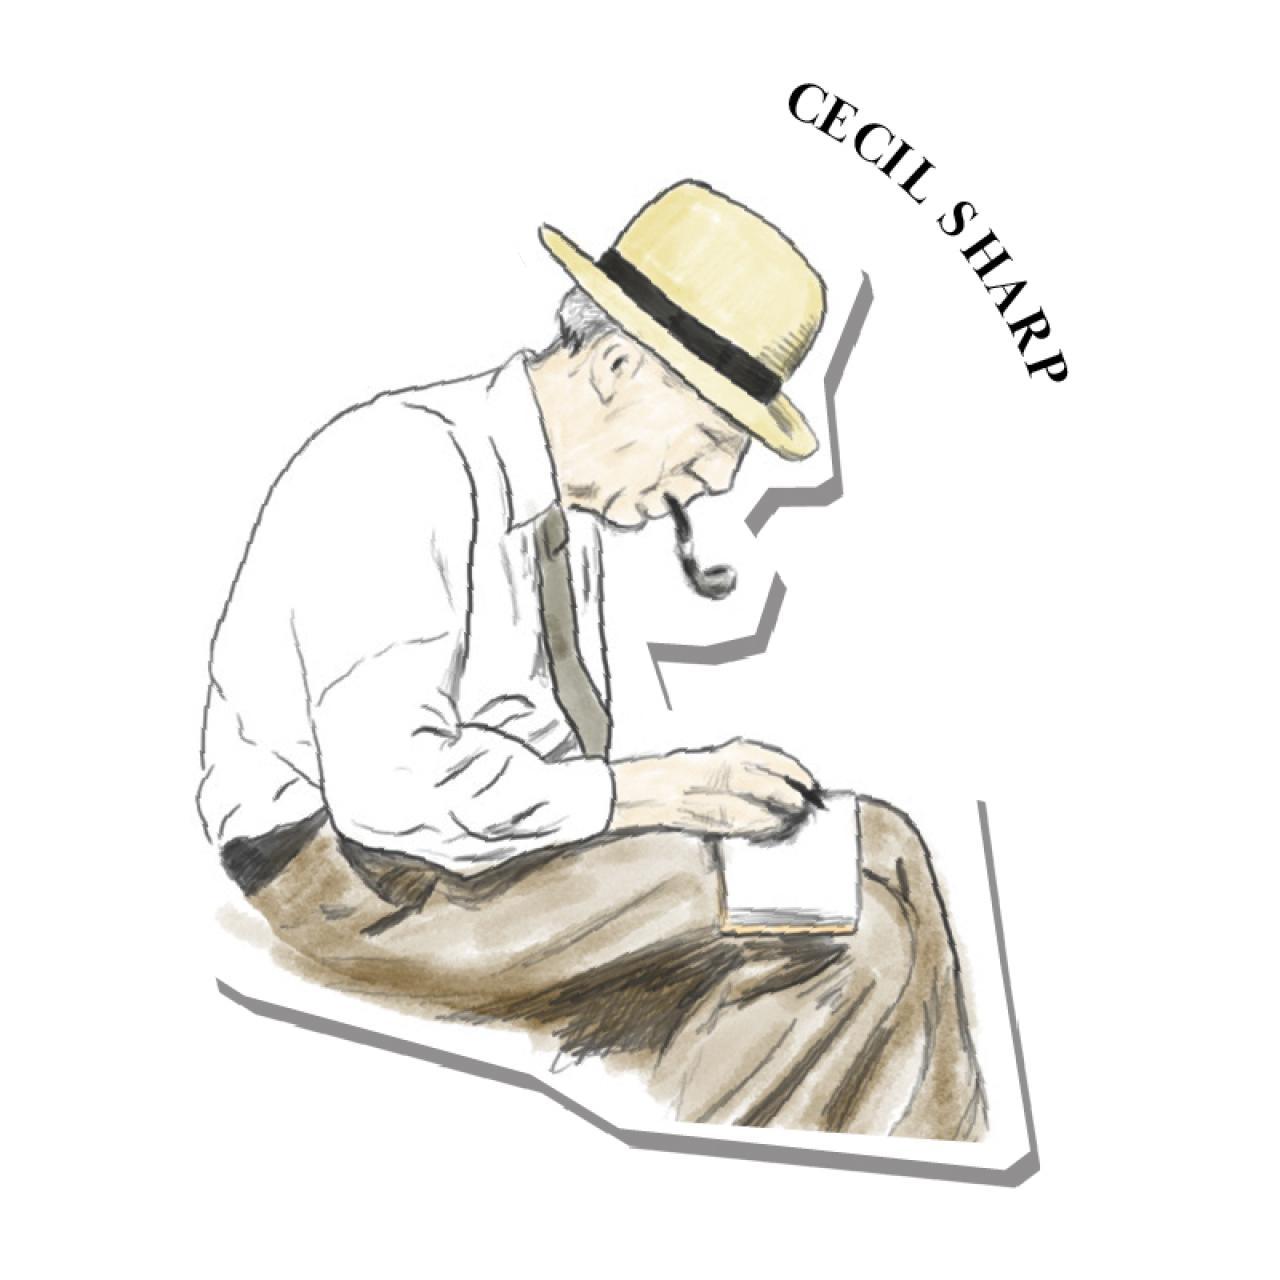 An illustration of Cecil Sharp